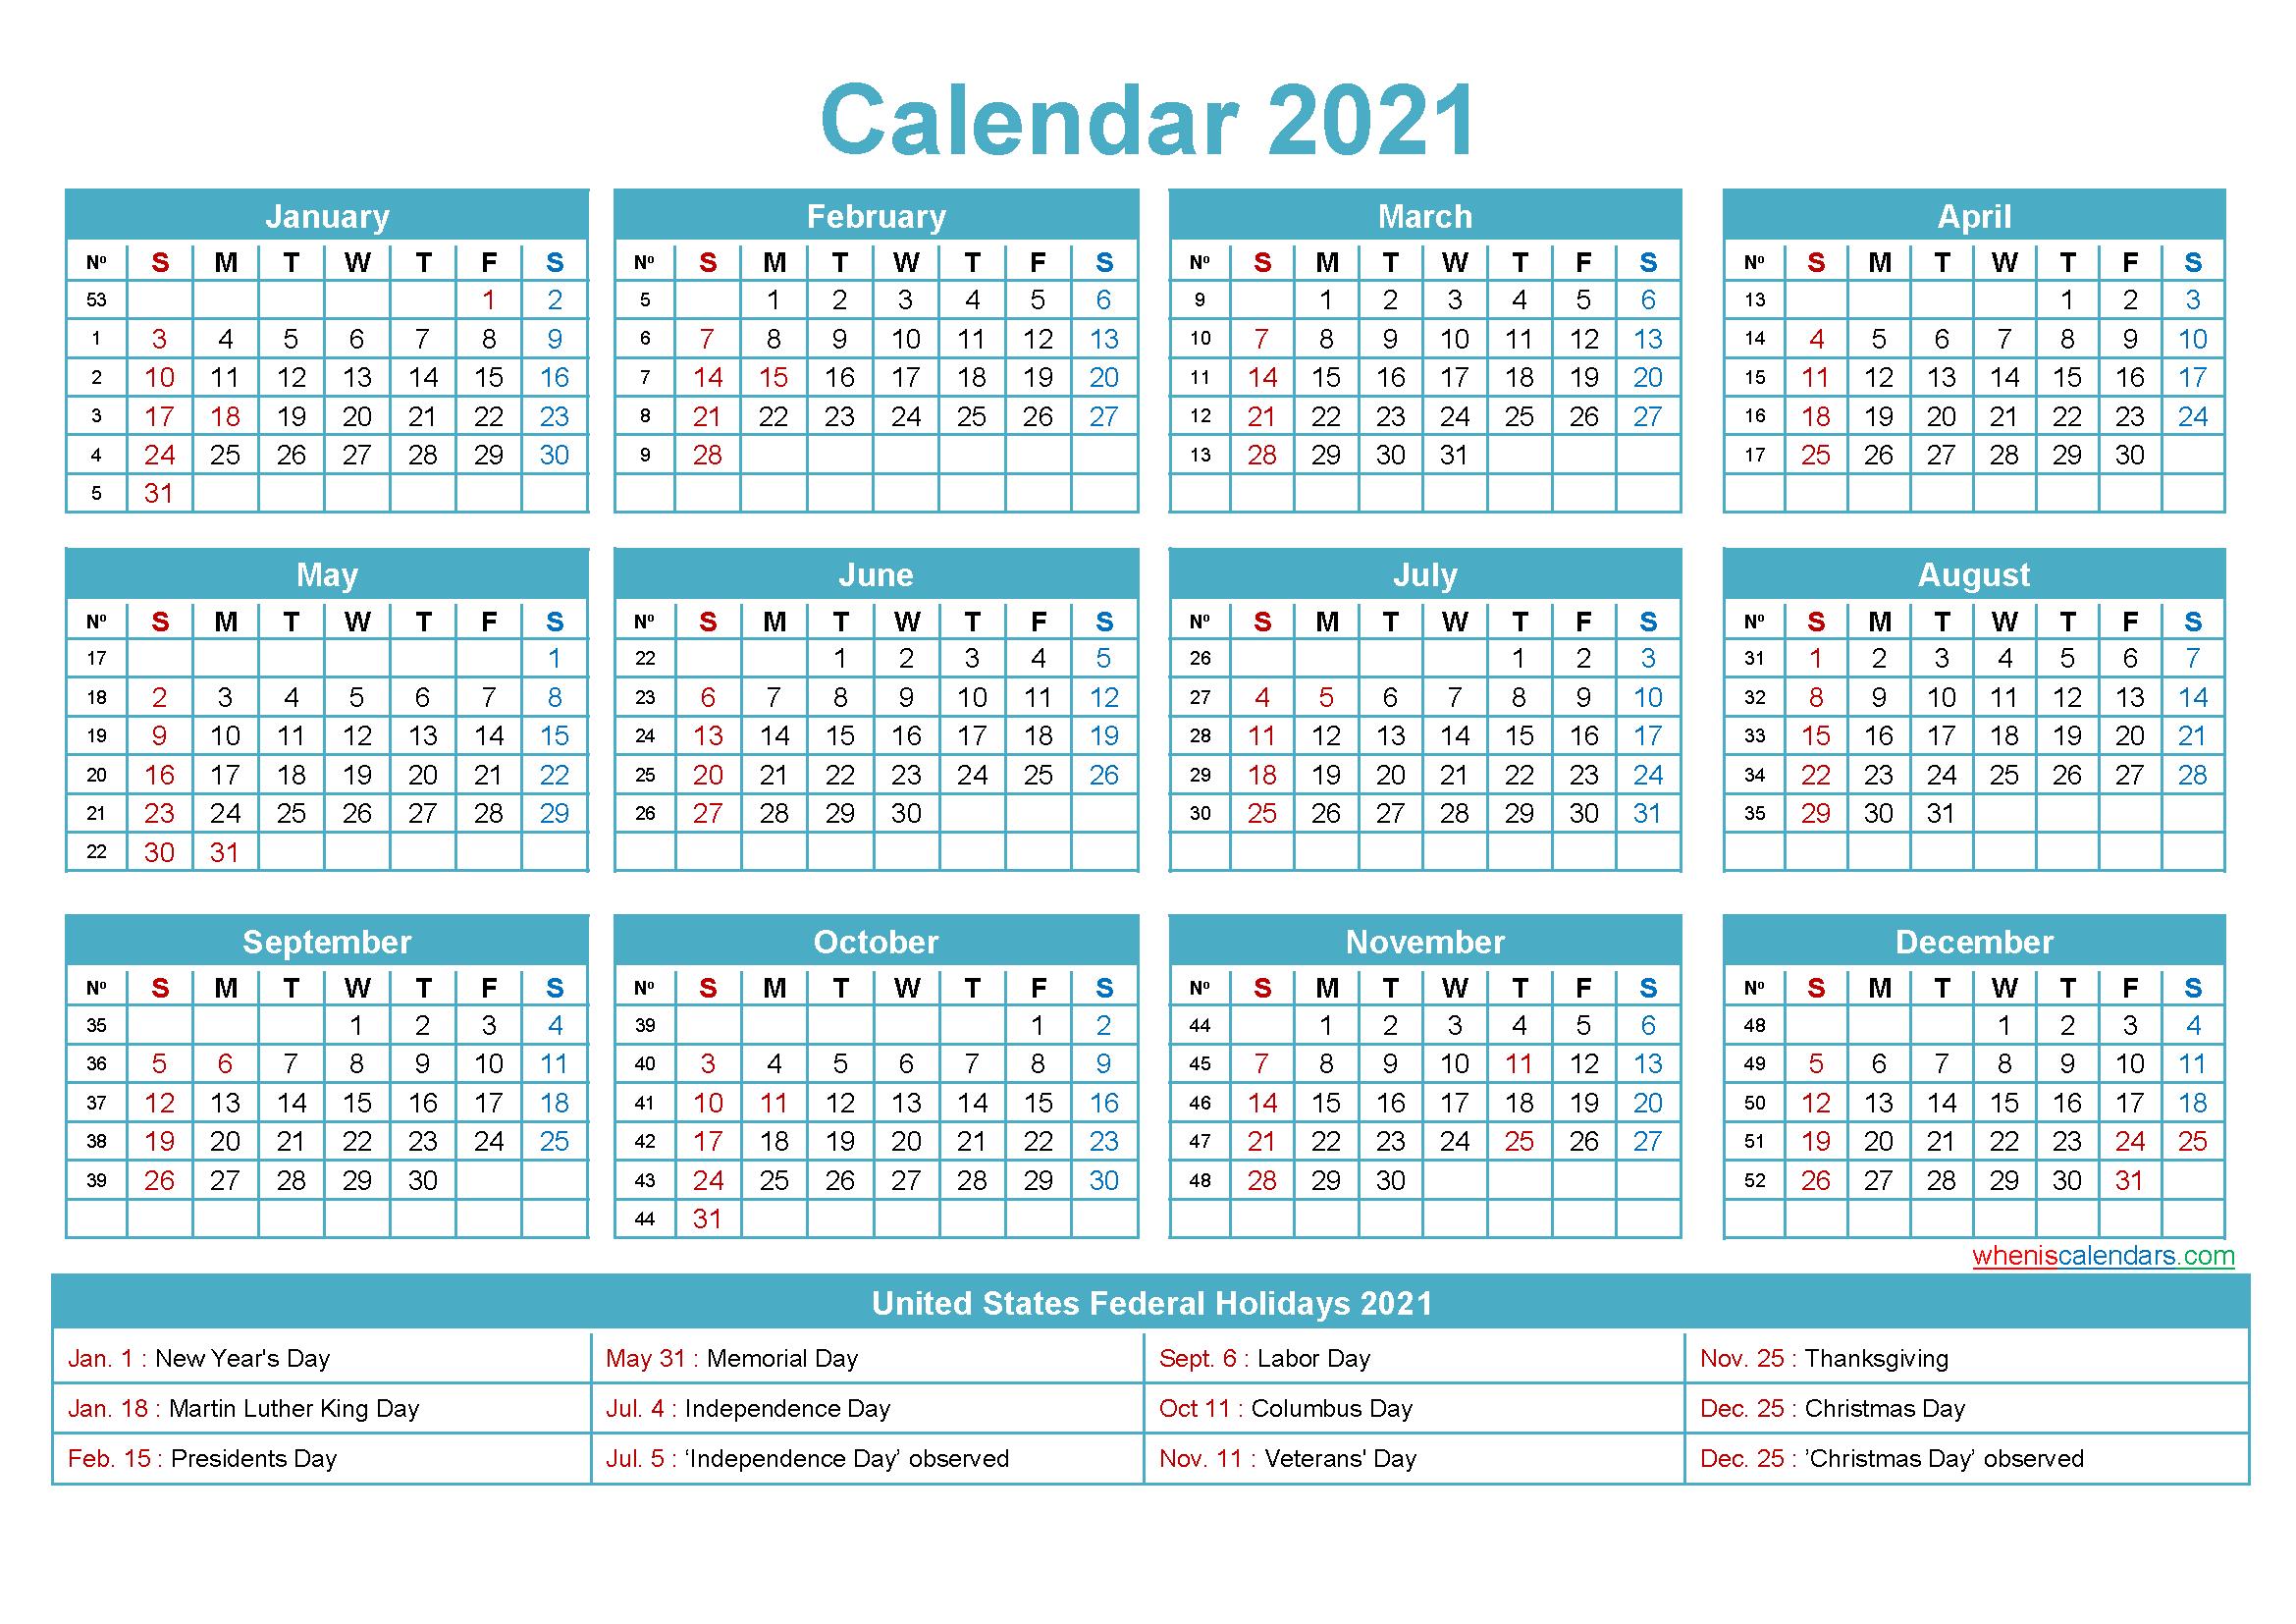 Free Editable Printable Calendar 2021  Template No.ep21Y5 in 2021 Calendar Free Printable